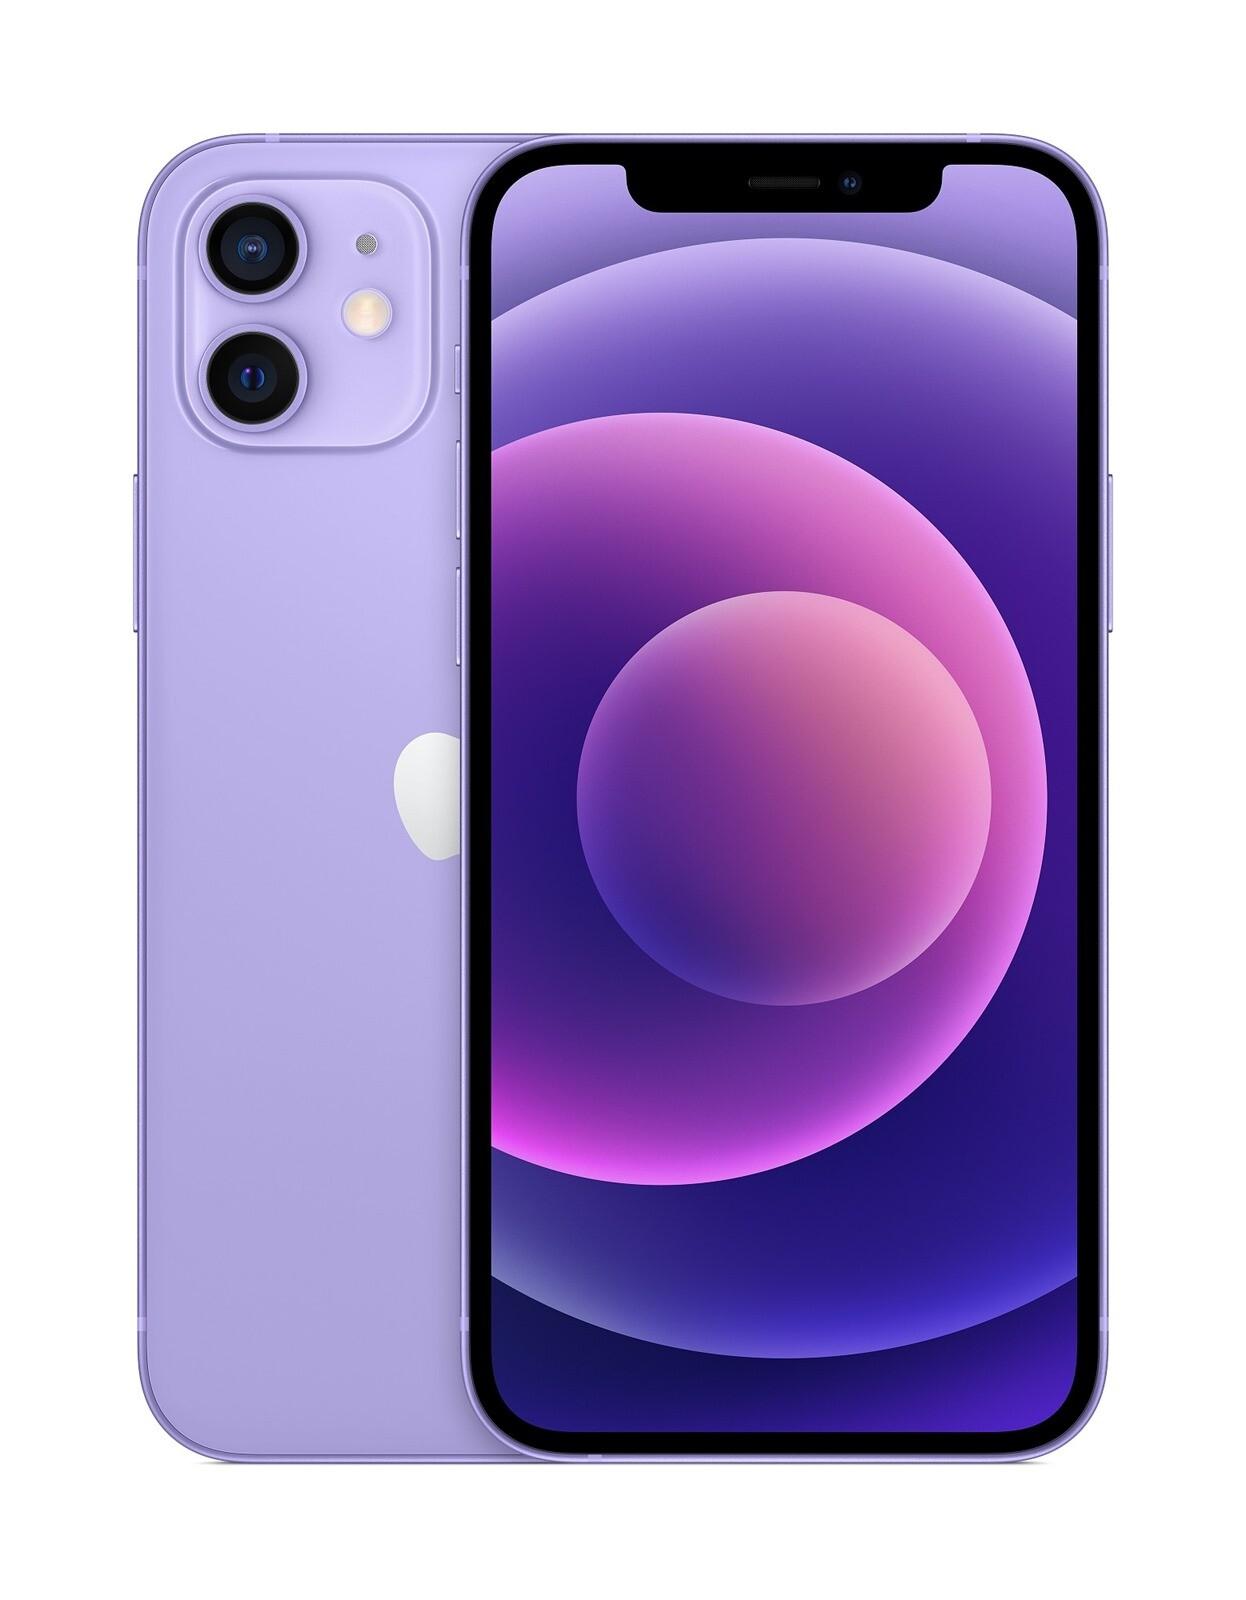 【PChome-24h 購物】iPhone-12/-iPhone-12-mini-紫色.jpg @3C 達人廖阿輝